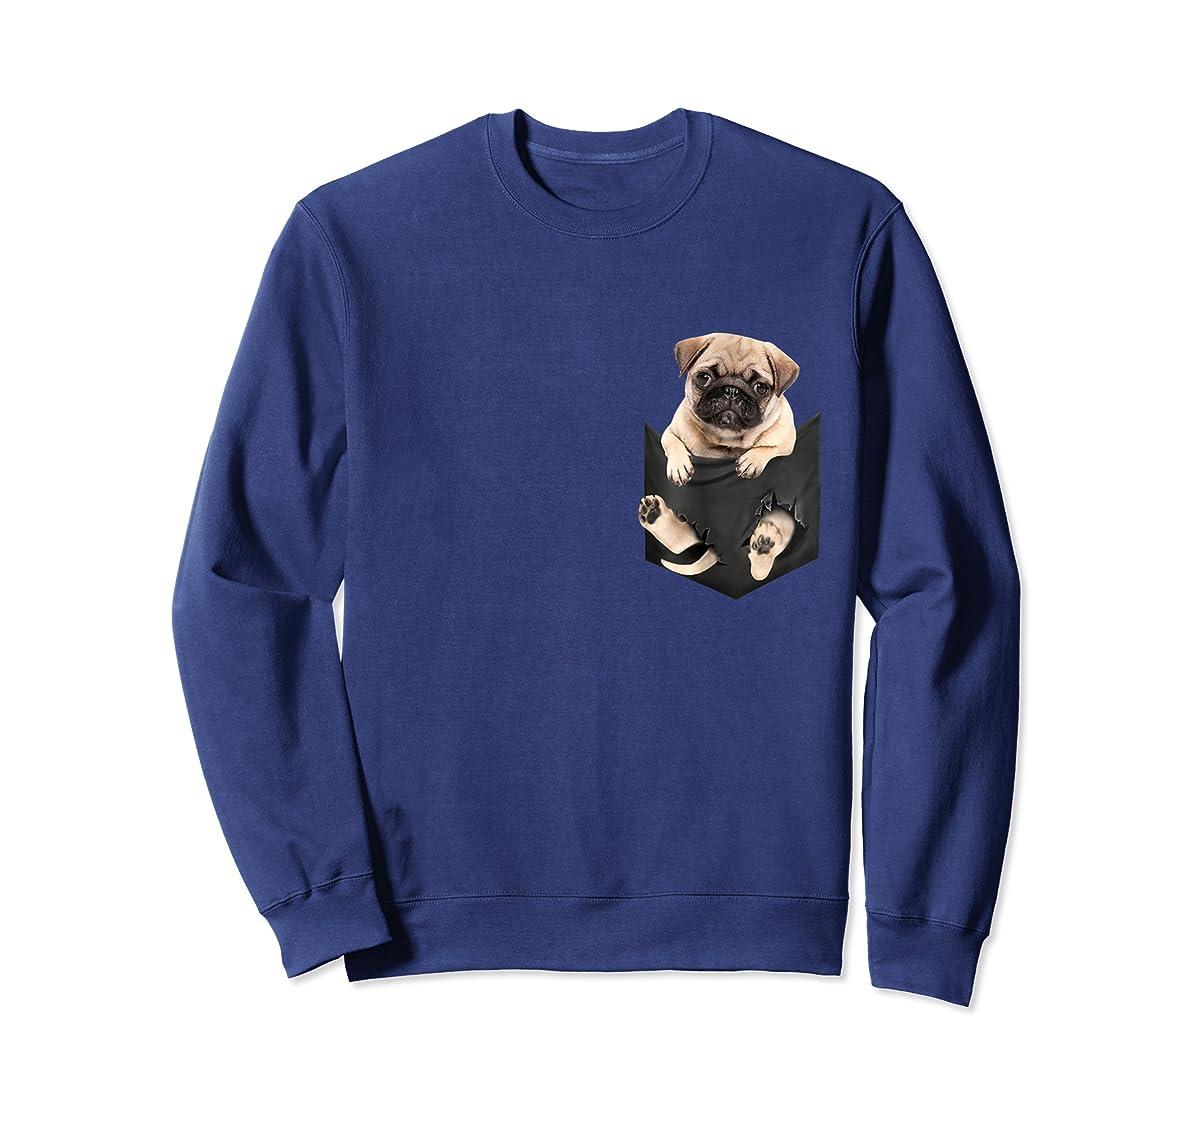 Dog in Your Pocket santa hat pug lover gift shirt-Sweatshirt-Navy